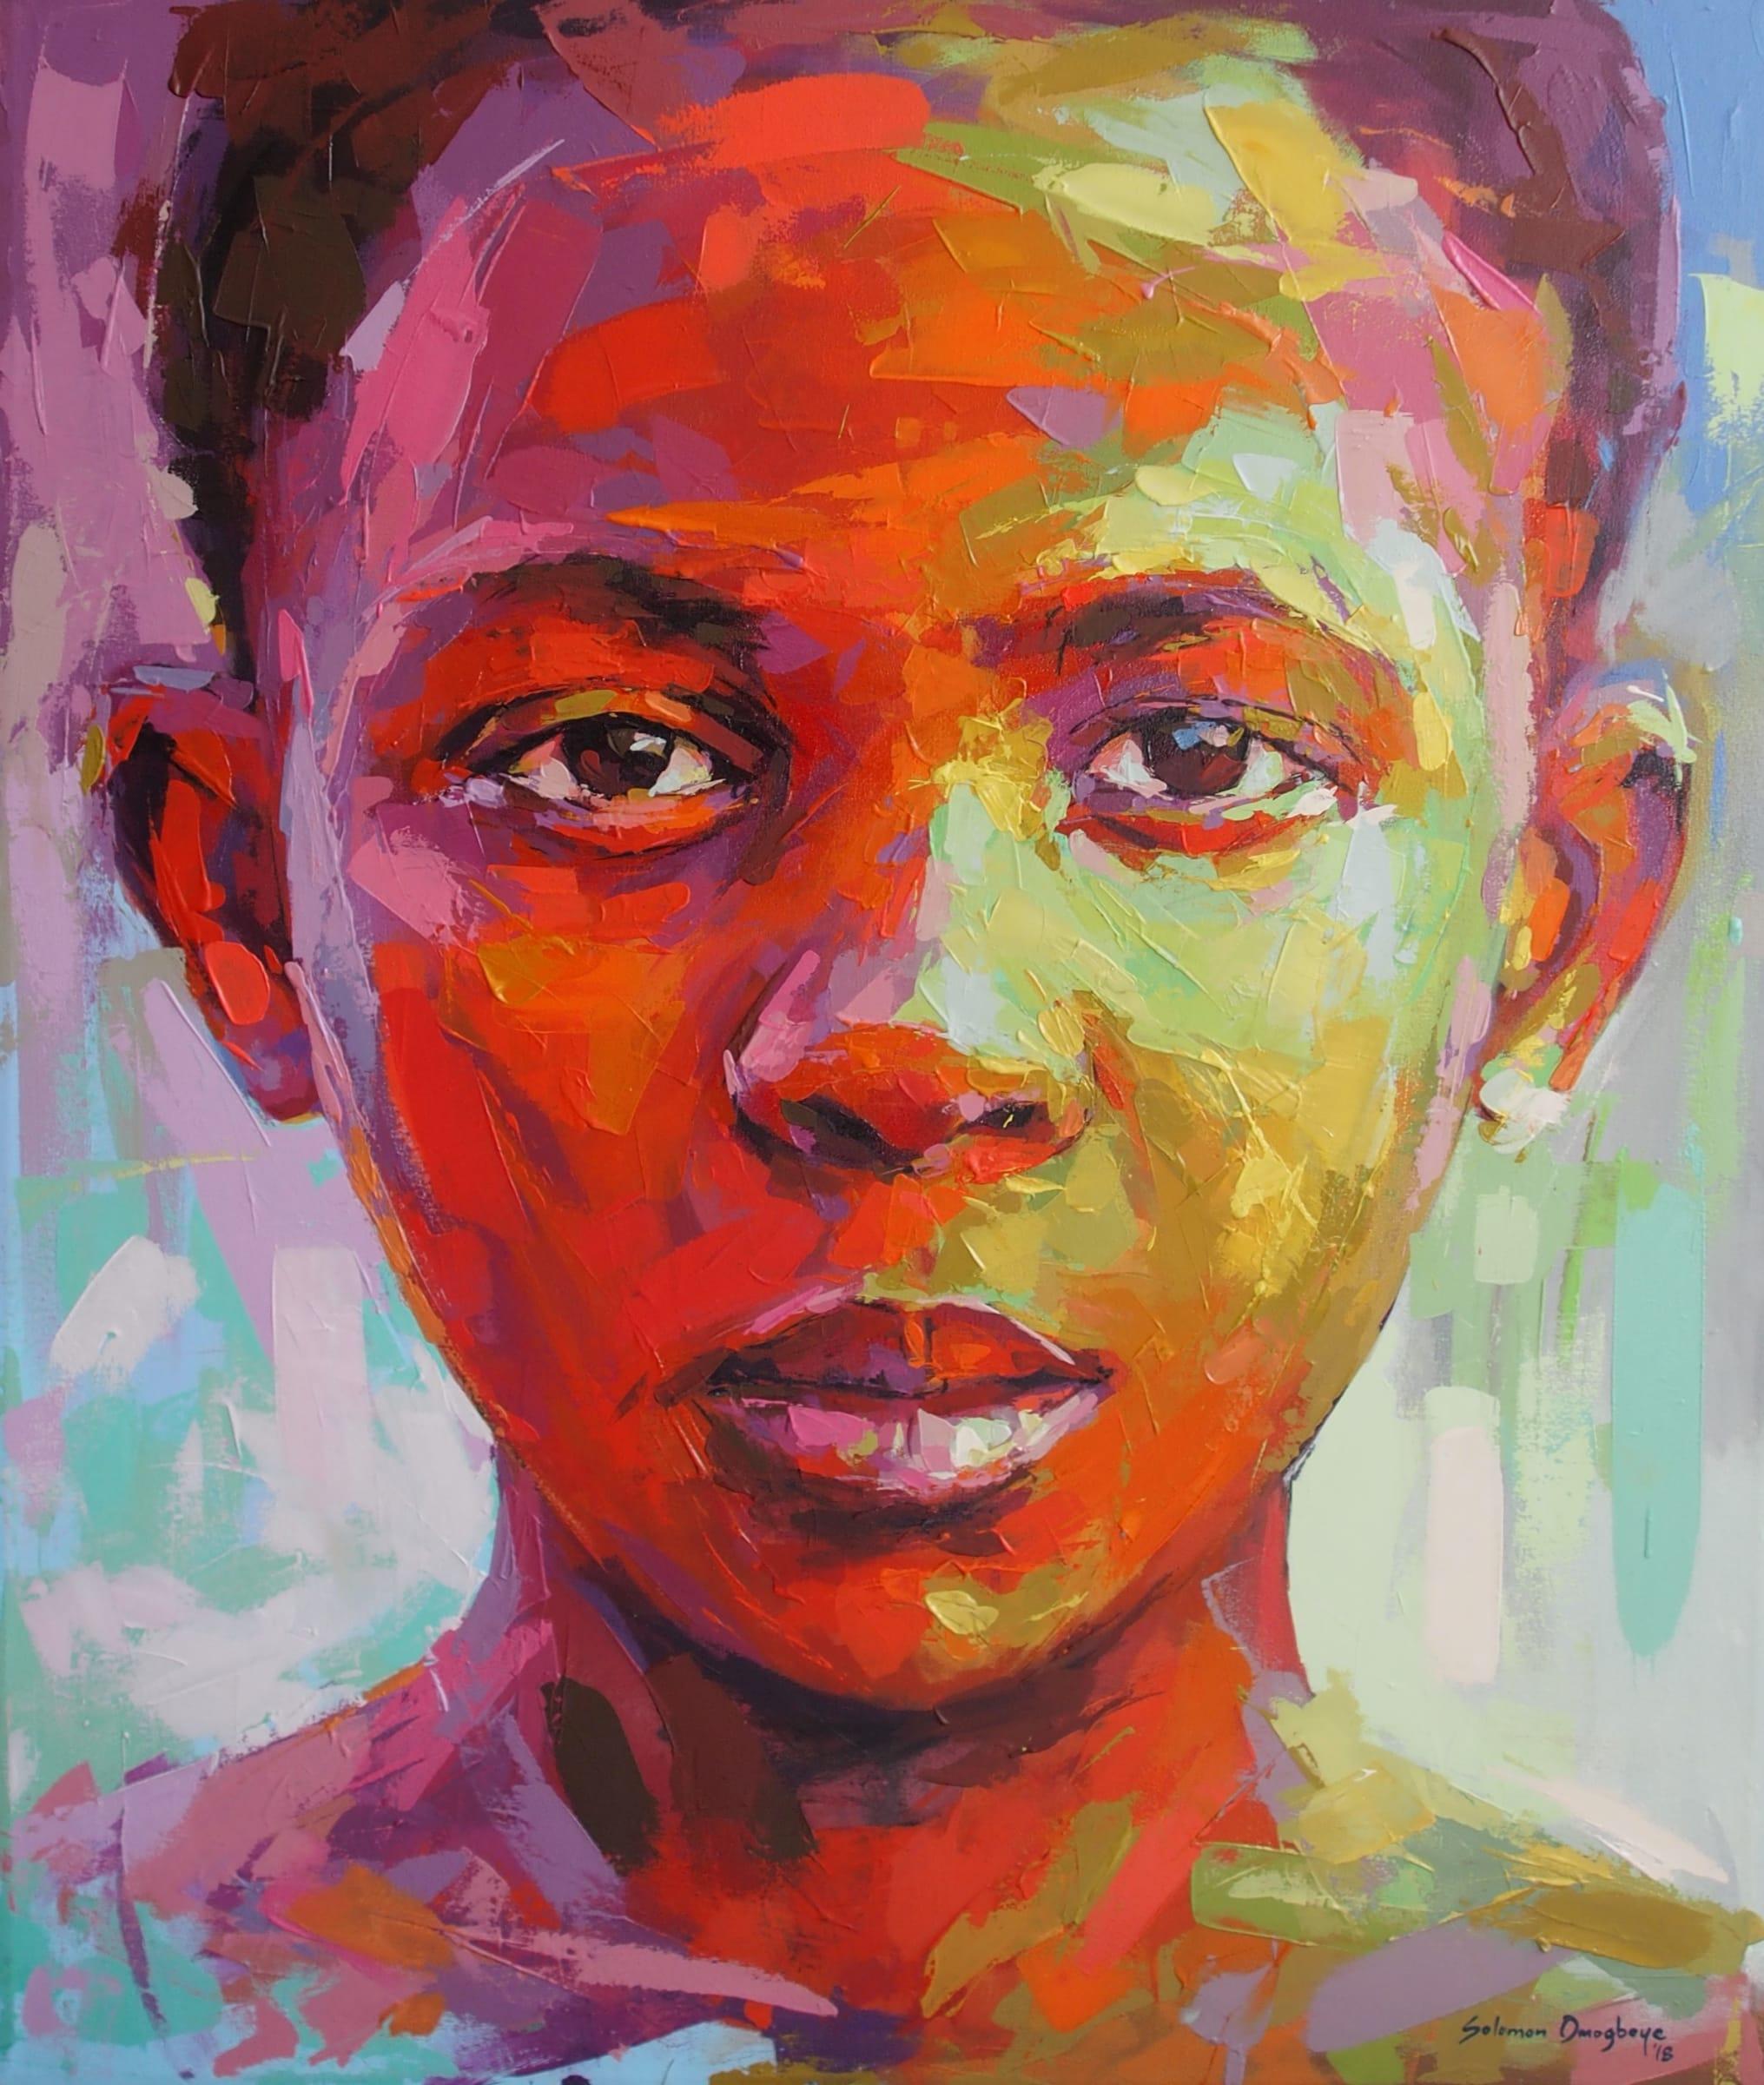 <span class=&#34;link fancybox-details-link&#34;><a href=&#34;/artists/39-solomon-omogboye/works/2018-solomon-omogboye-orange-2018/&#34;>View Detail Page</a></span><div class=&#34;artist&#34;><strong>Solomon Omogboye</strong></div> <div class=&#34;title&#34;><em>Orange</em>, 2018</div> <div class=&#34;medium&#34;>Acrylic On Canvas</div> <div class=&#34;dimensions&#34;>110cm x 130cm</div>